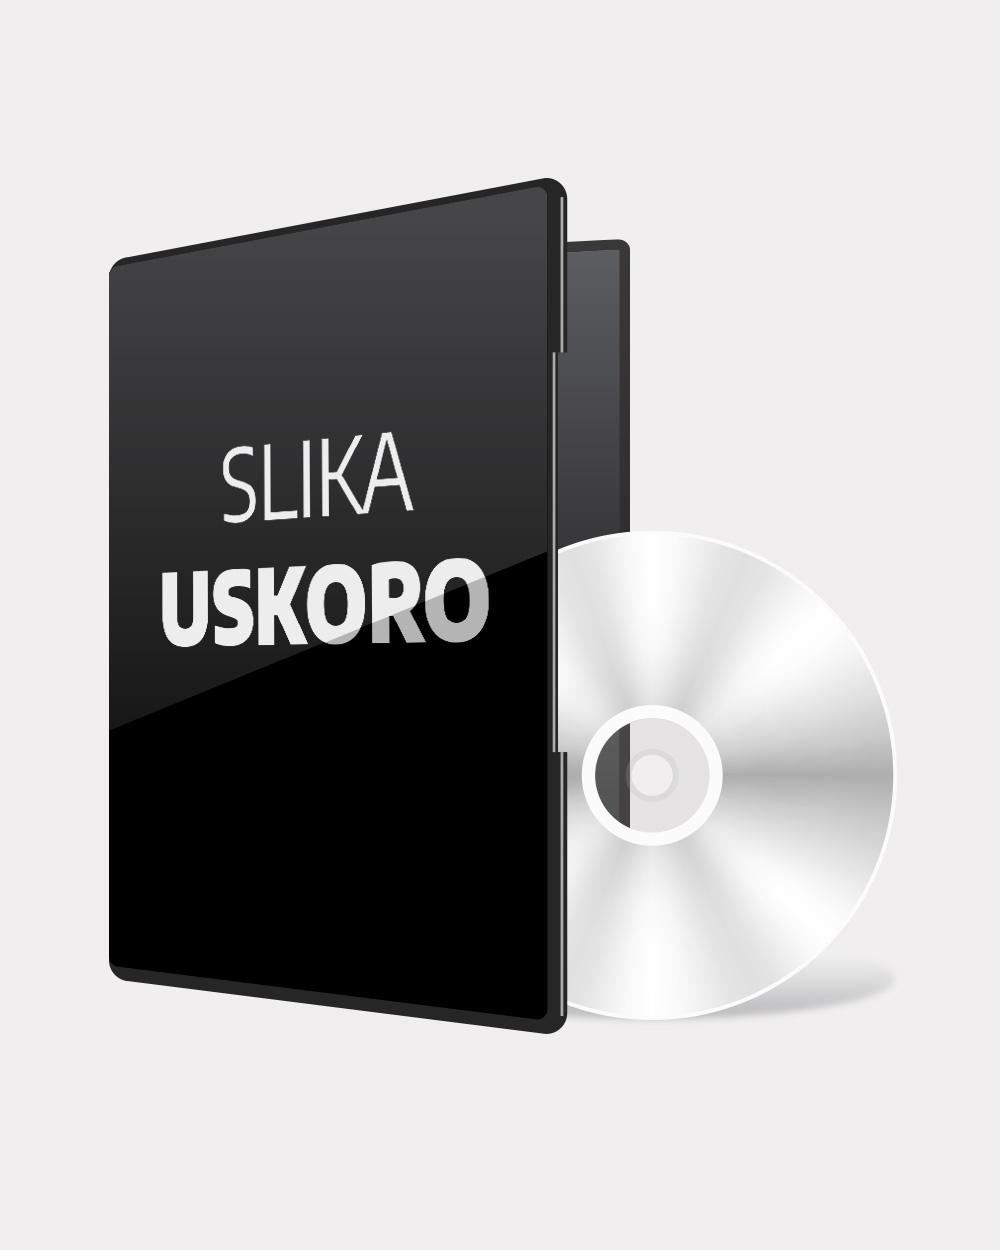 PCG Cuban Missile Crisis